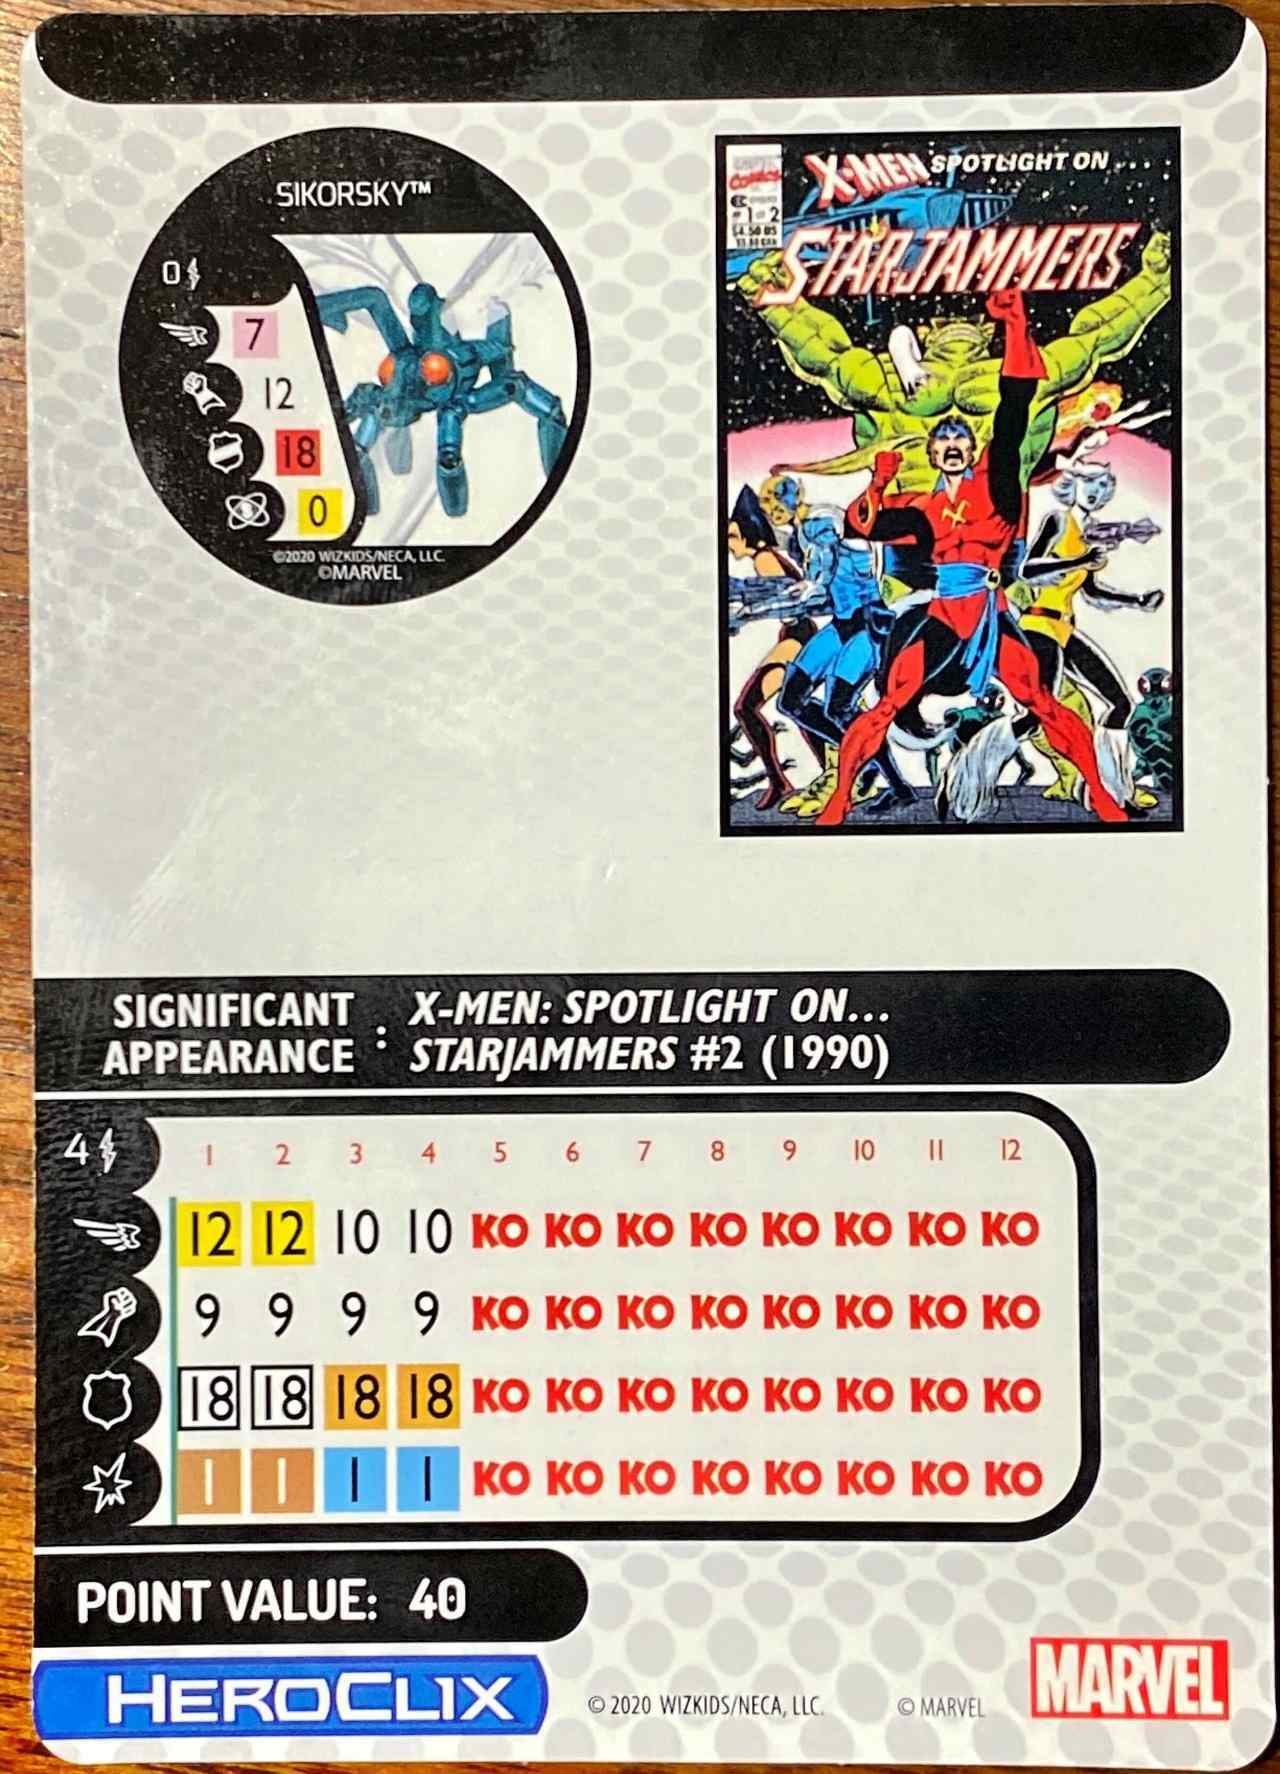 Marvel X-Men House of X HeroClix Waldo (2)